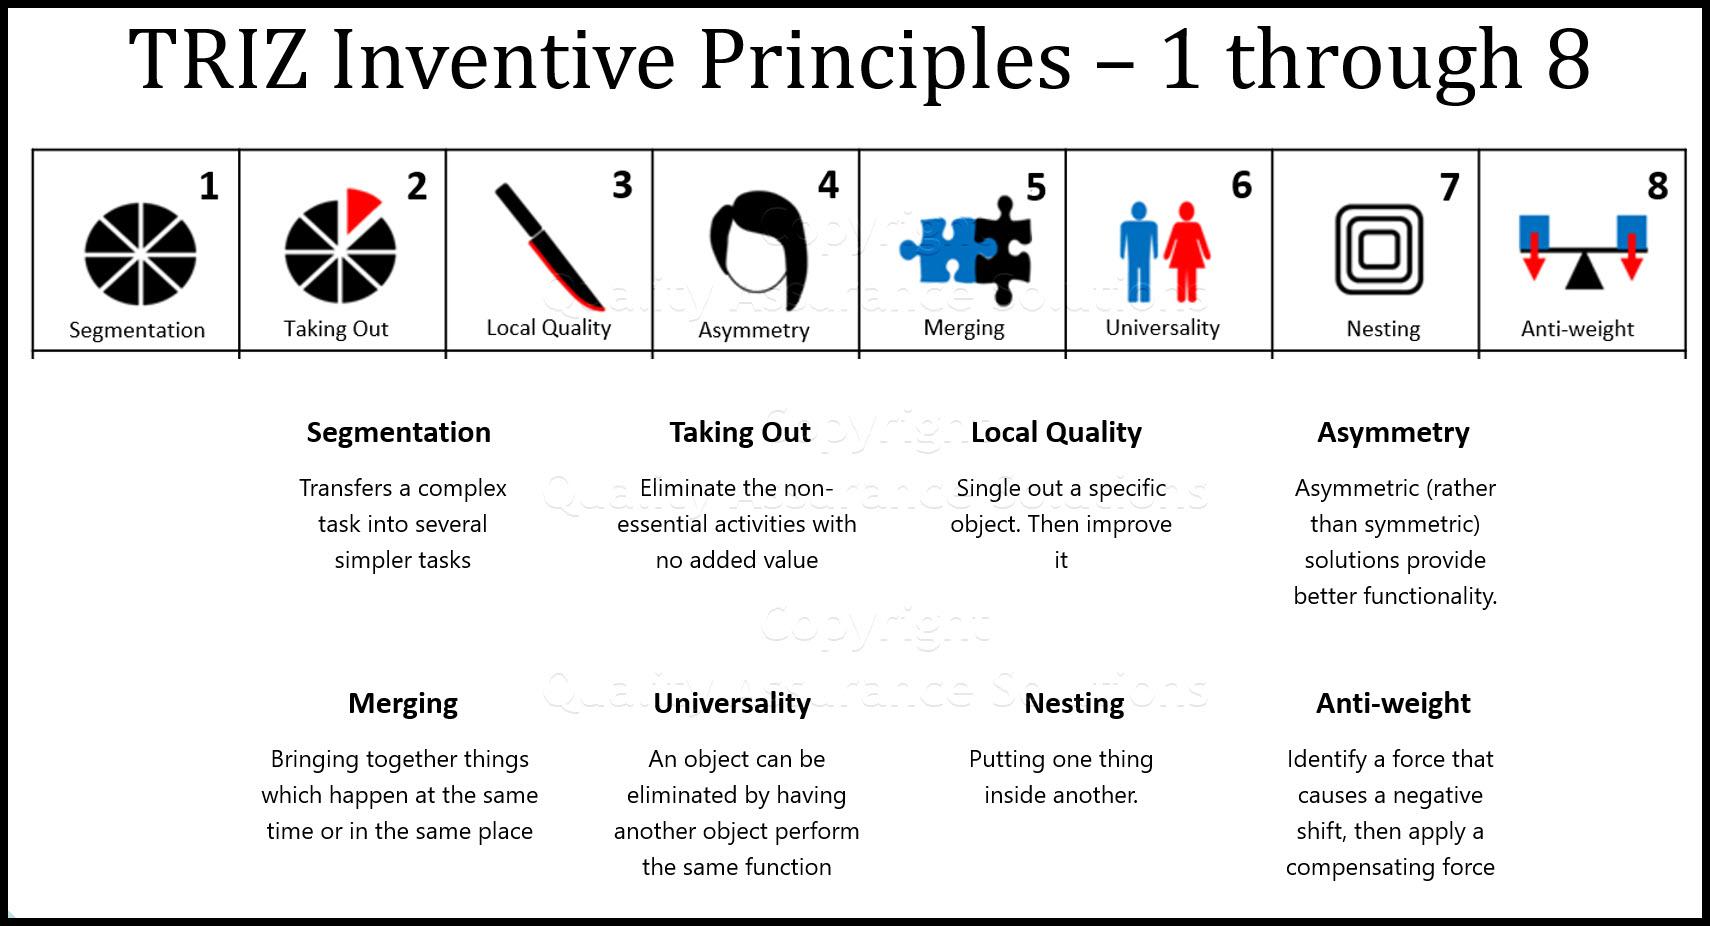 Triz Inventive Principles-1 business slide